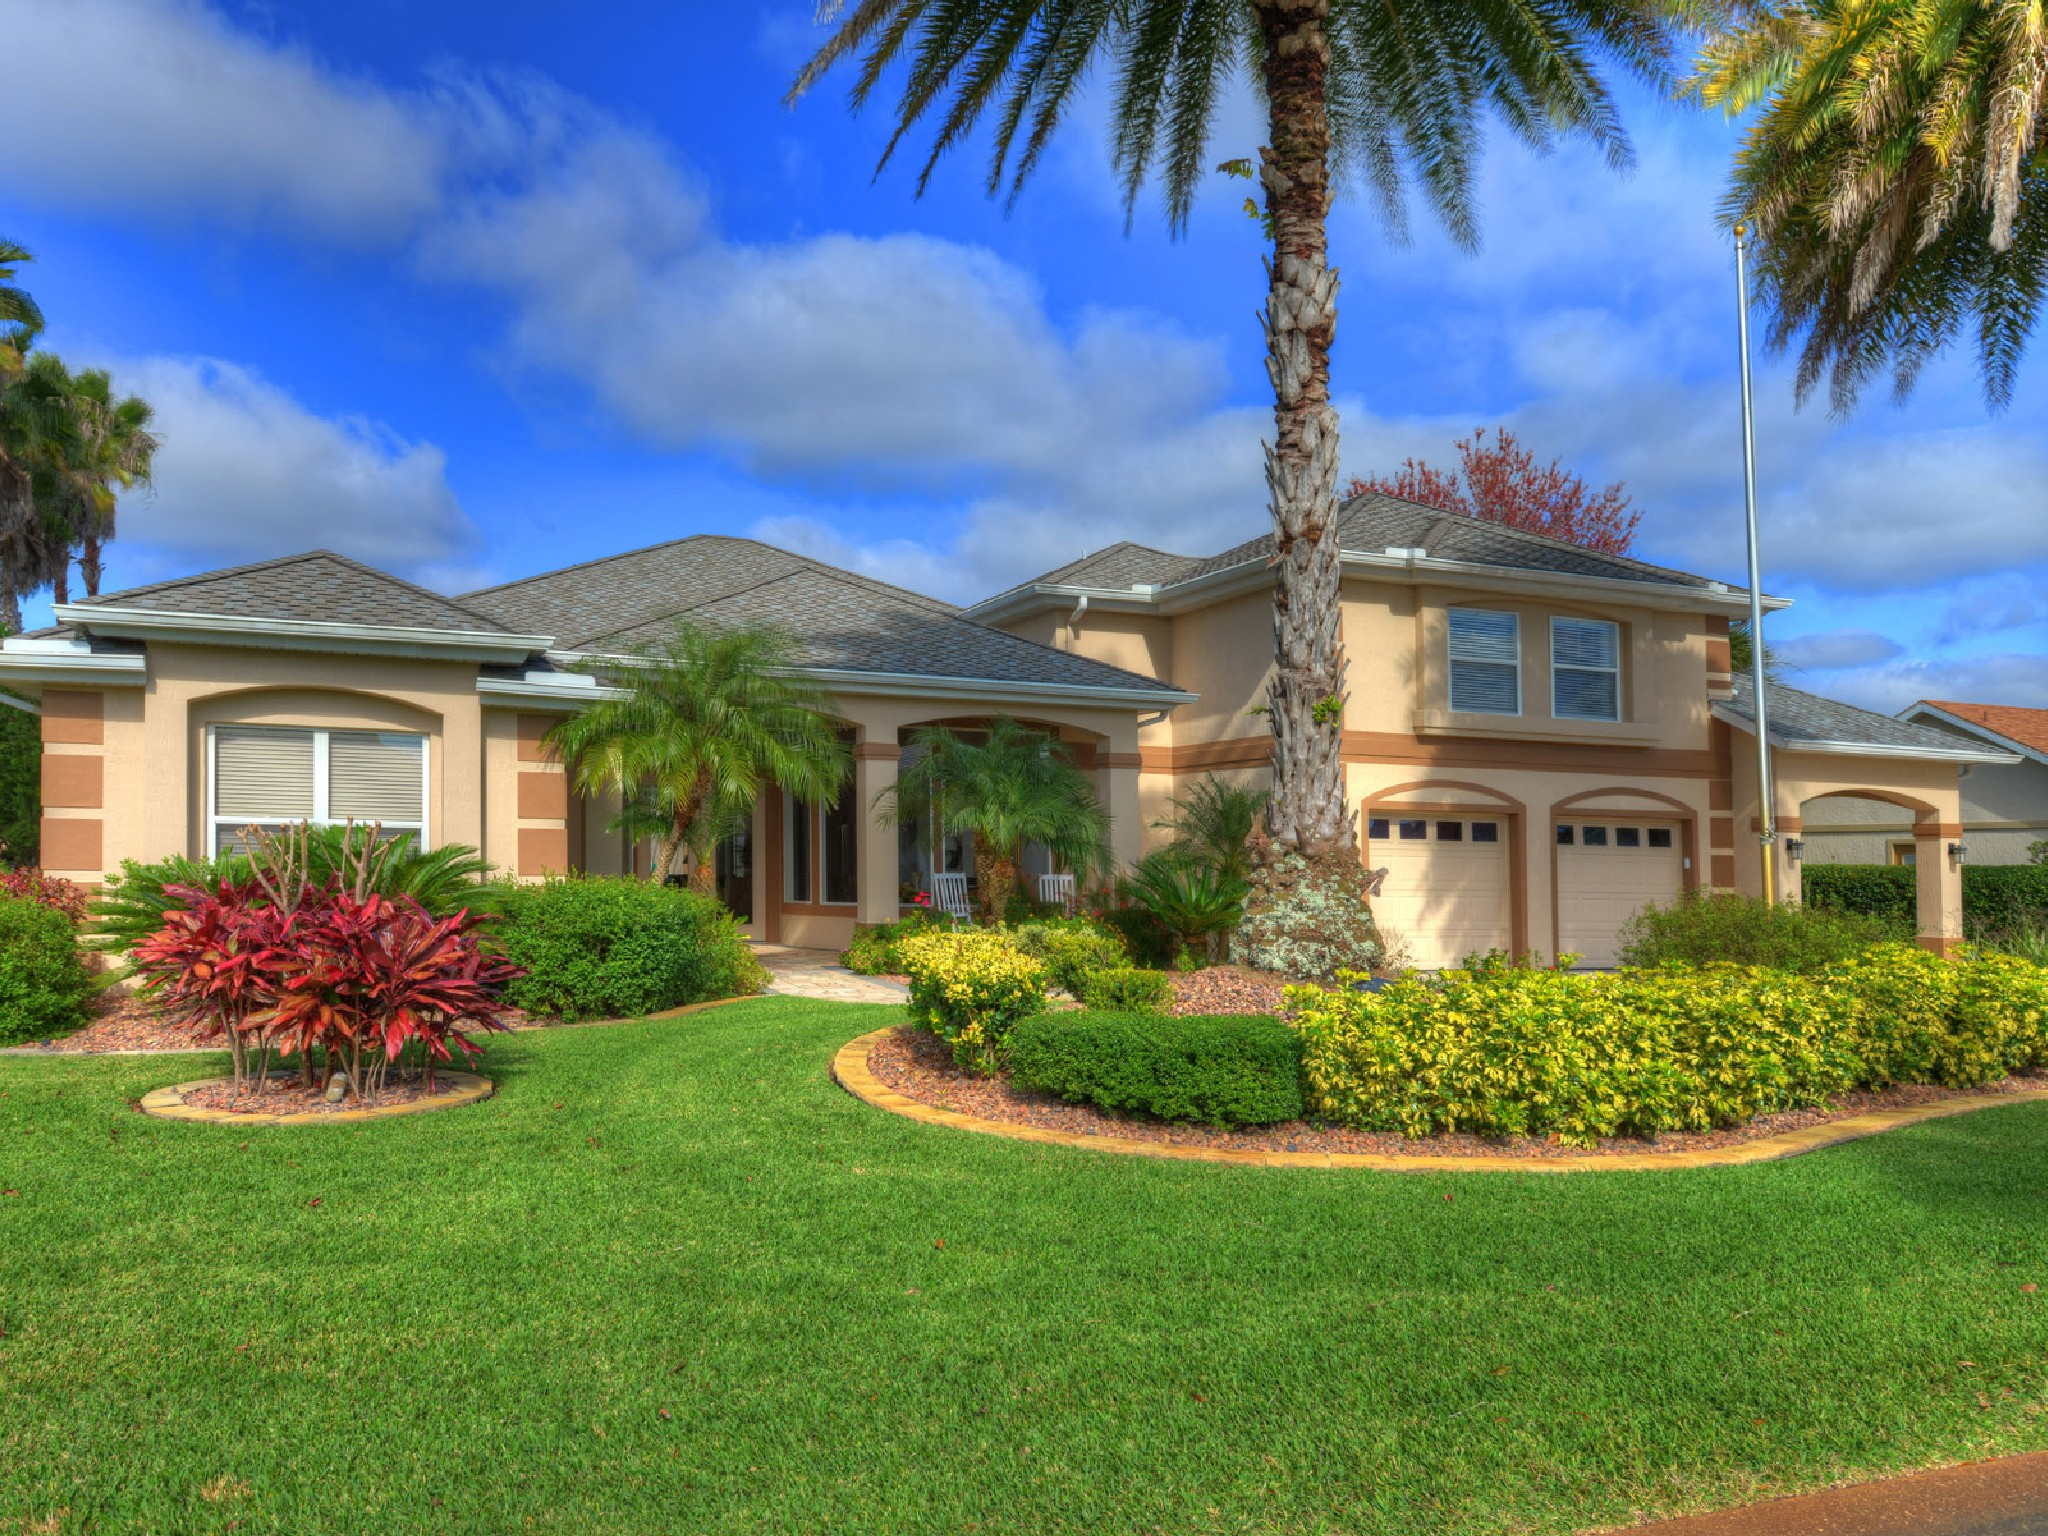 Vivienda unifamiliar por un Venta en Daytona Beach, Florida 2895 Borman Court Port Orange, Florida 32128 Estados Unidos